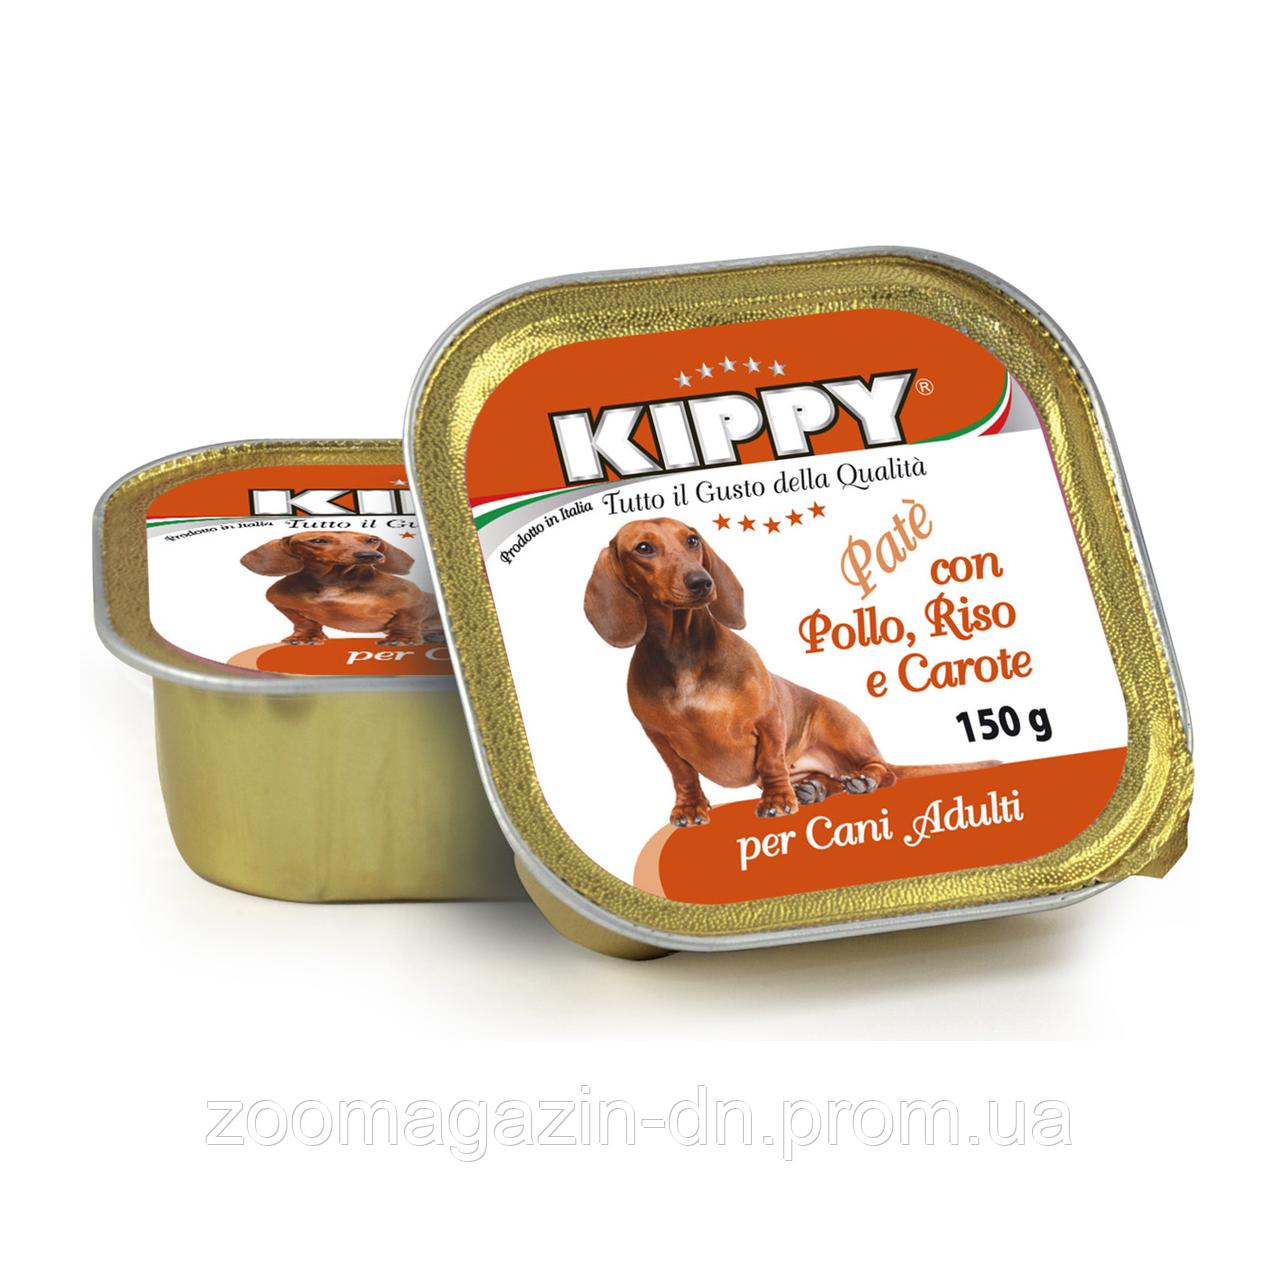 KIPPY Dog 150g. курица, рис, морковь